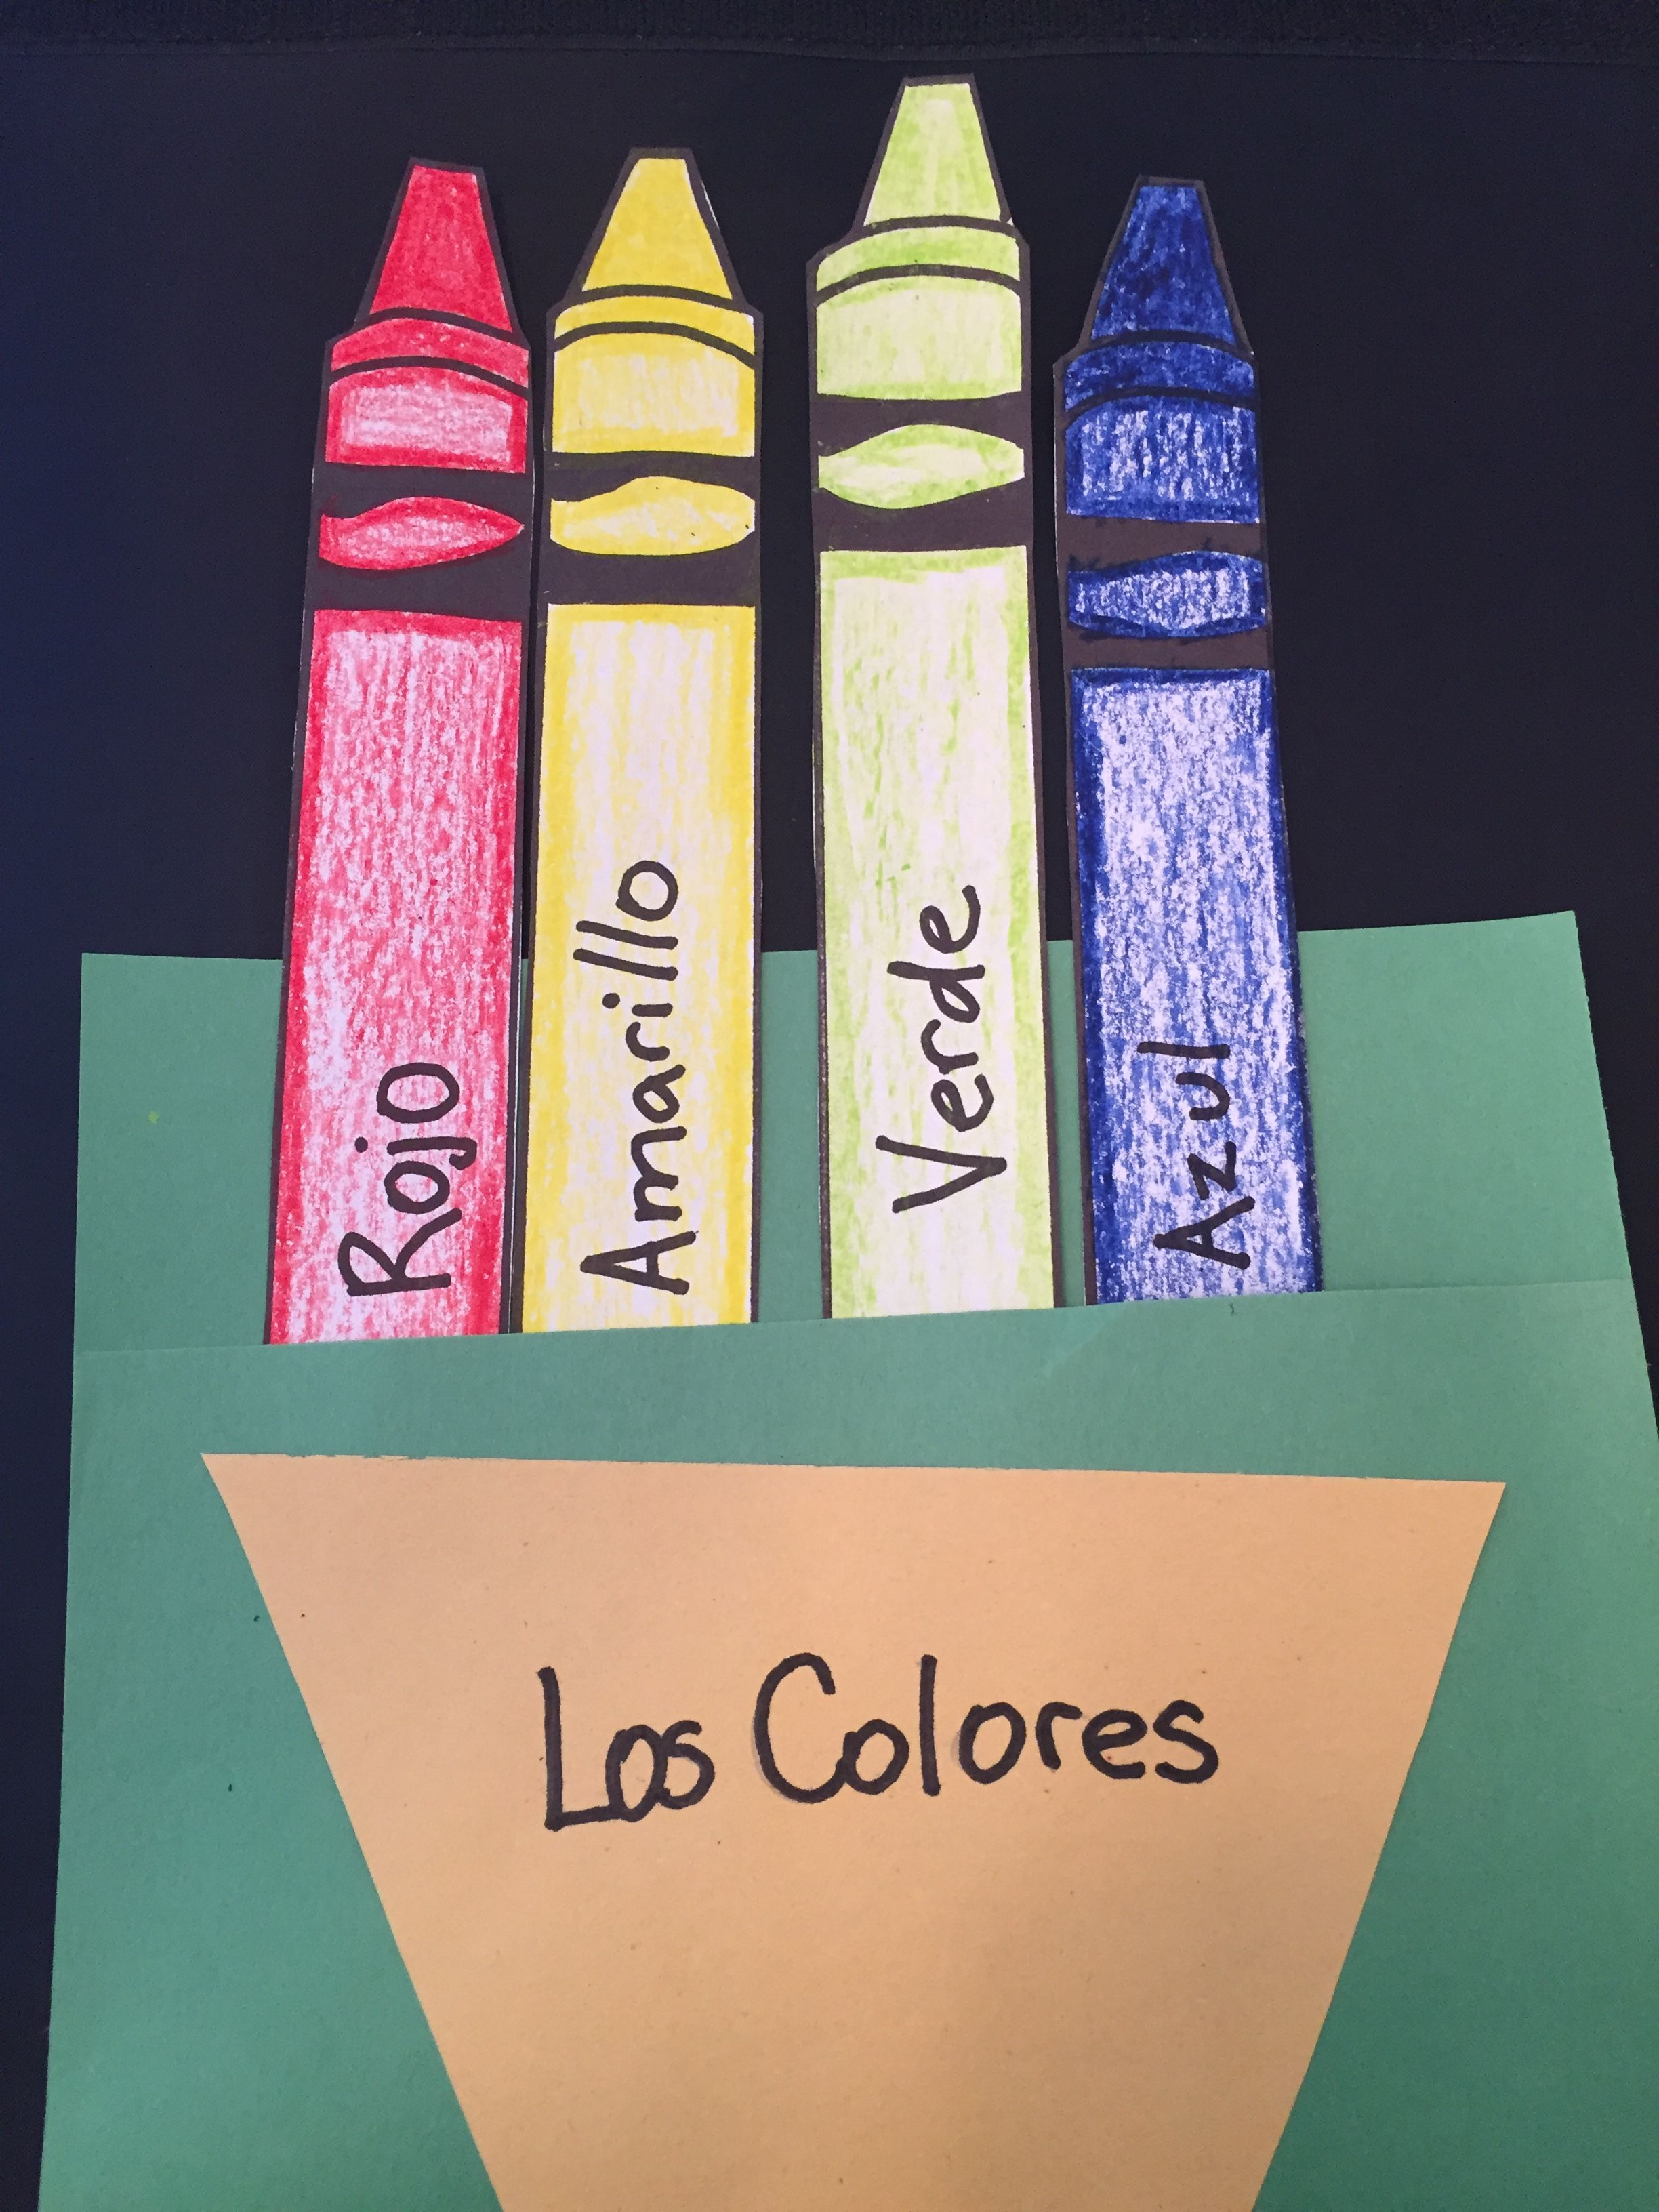 Colors In Spanish For Kids In